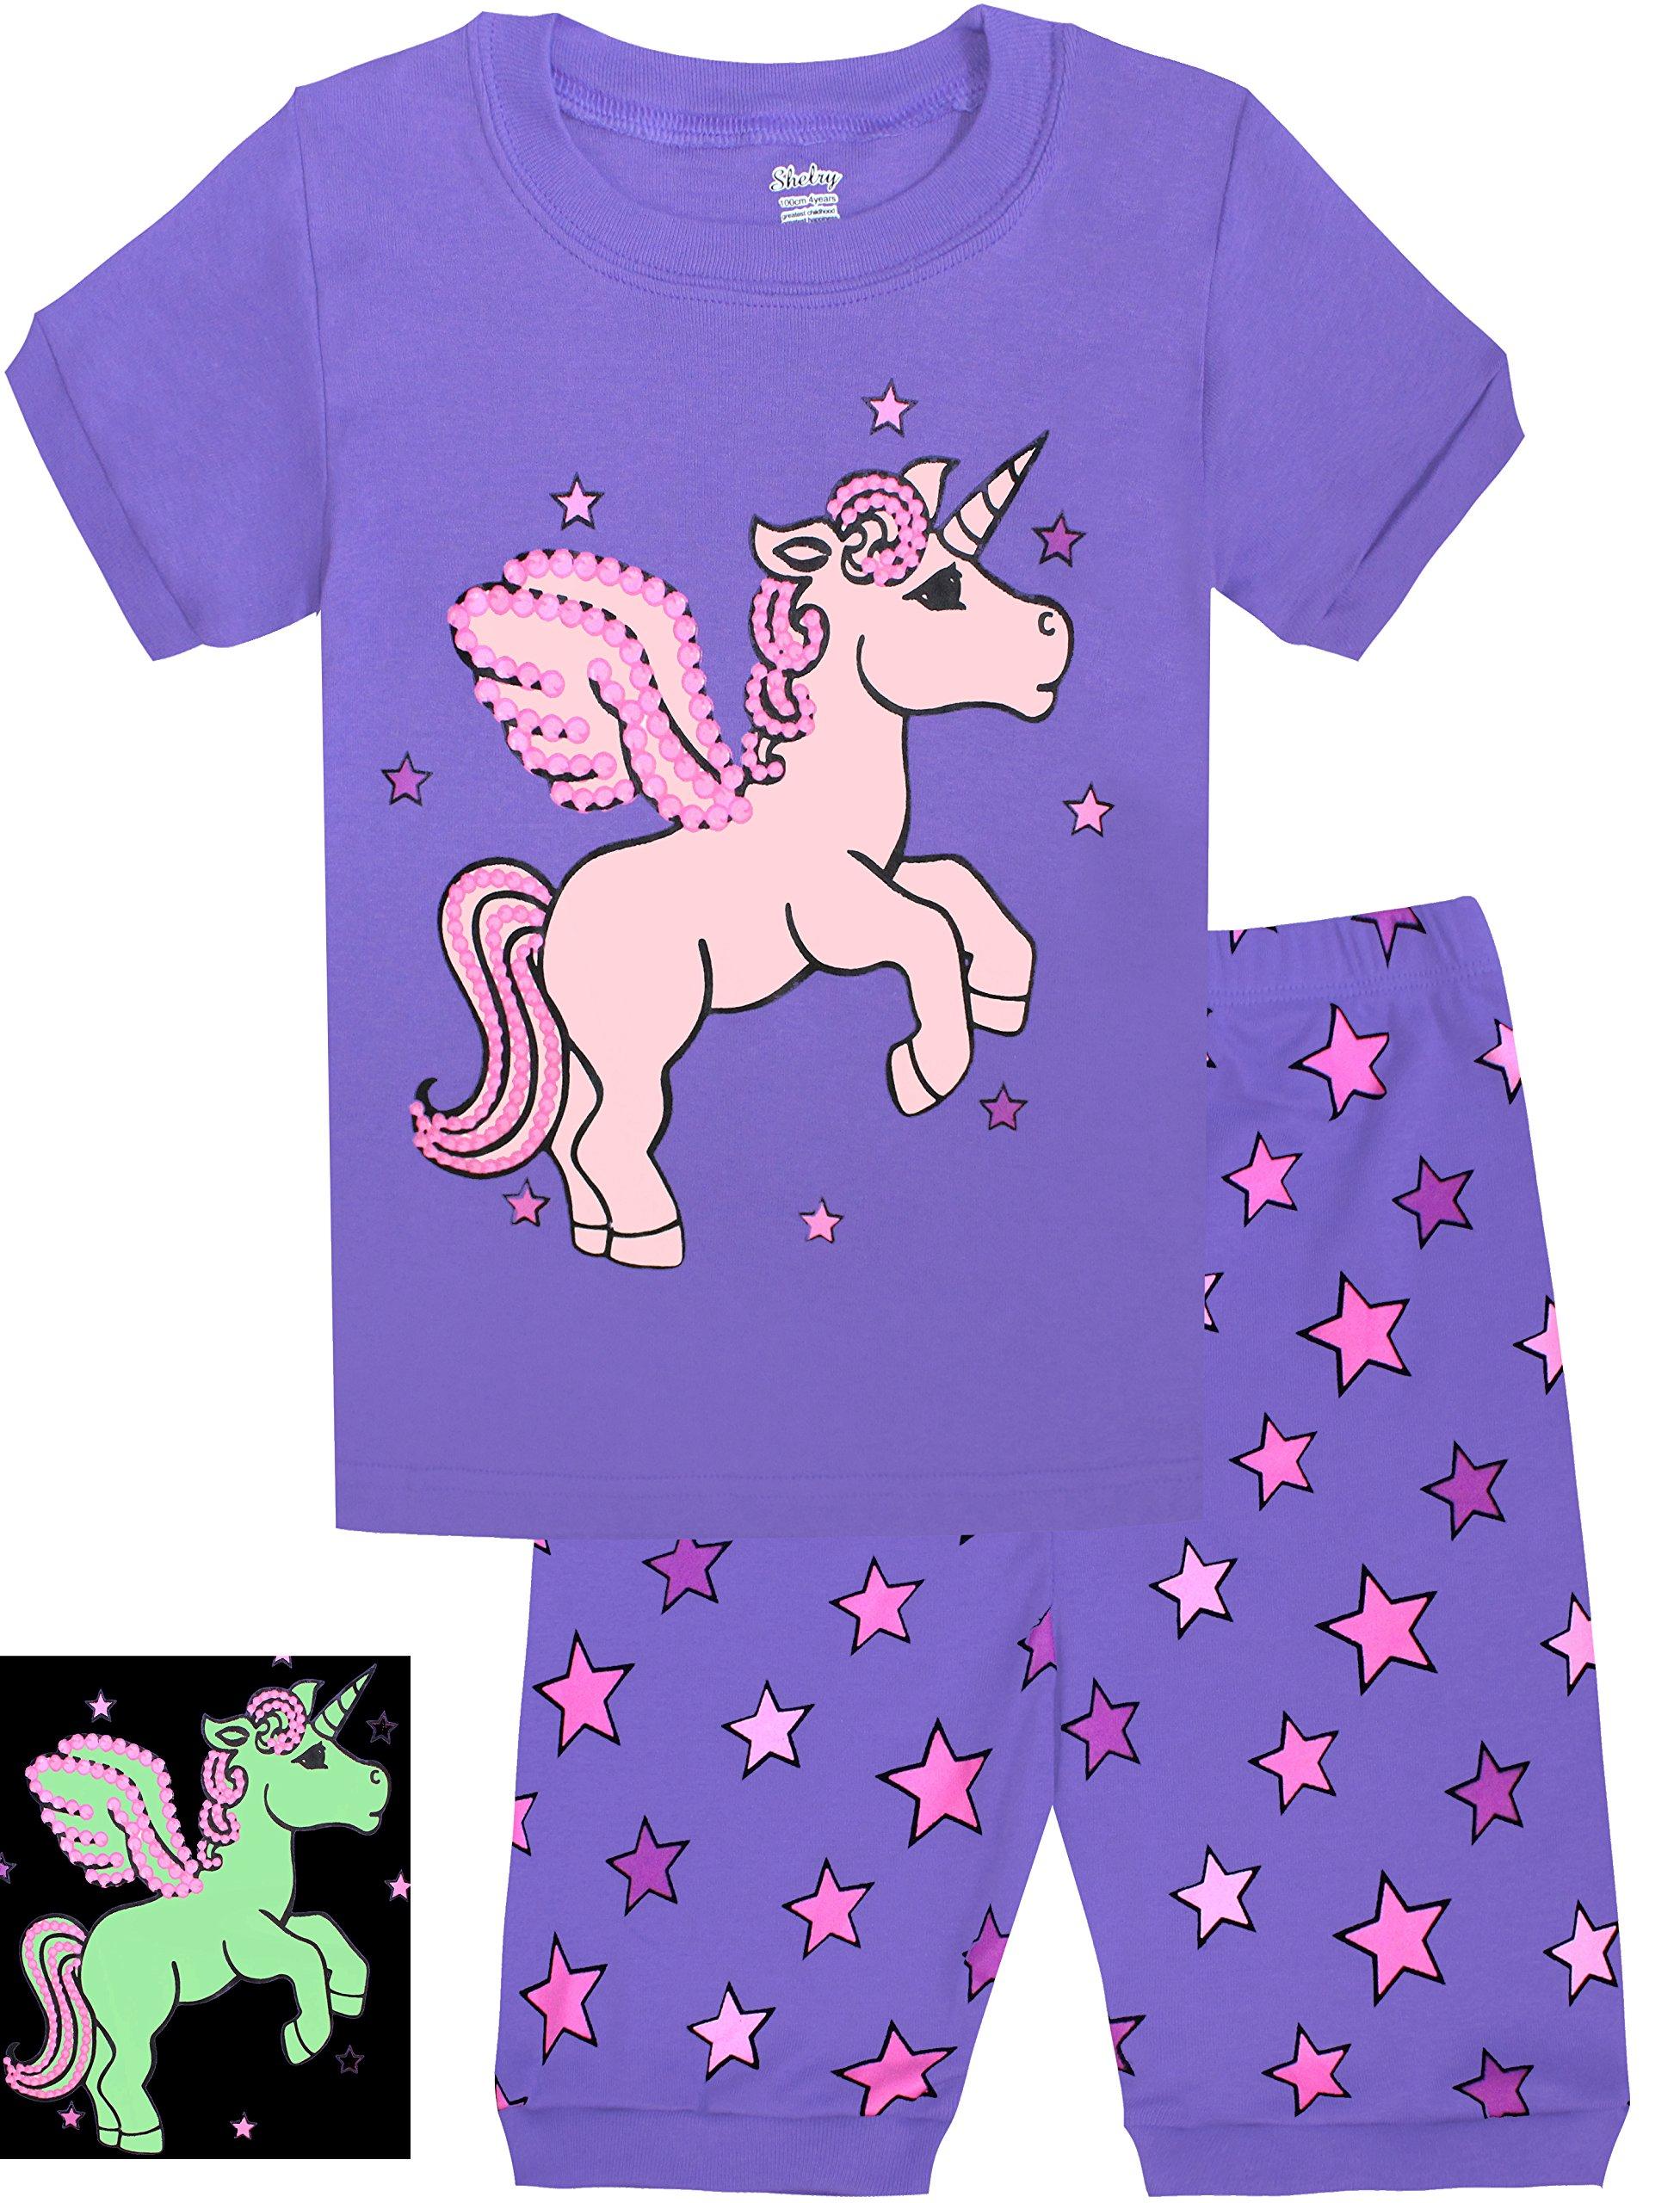 shelry Girls Horse Pajamas Shine at Night Sleepwear Children Cotton PJs Size 6Y